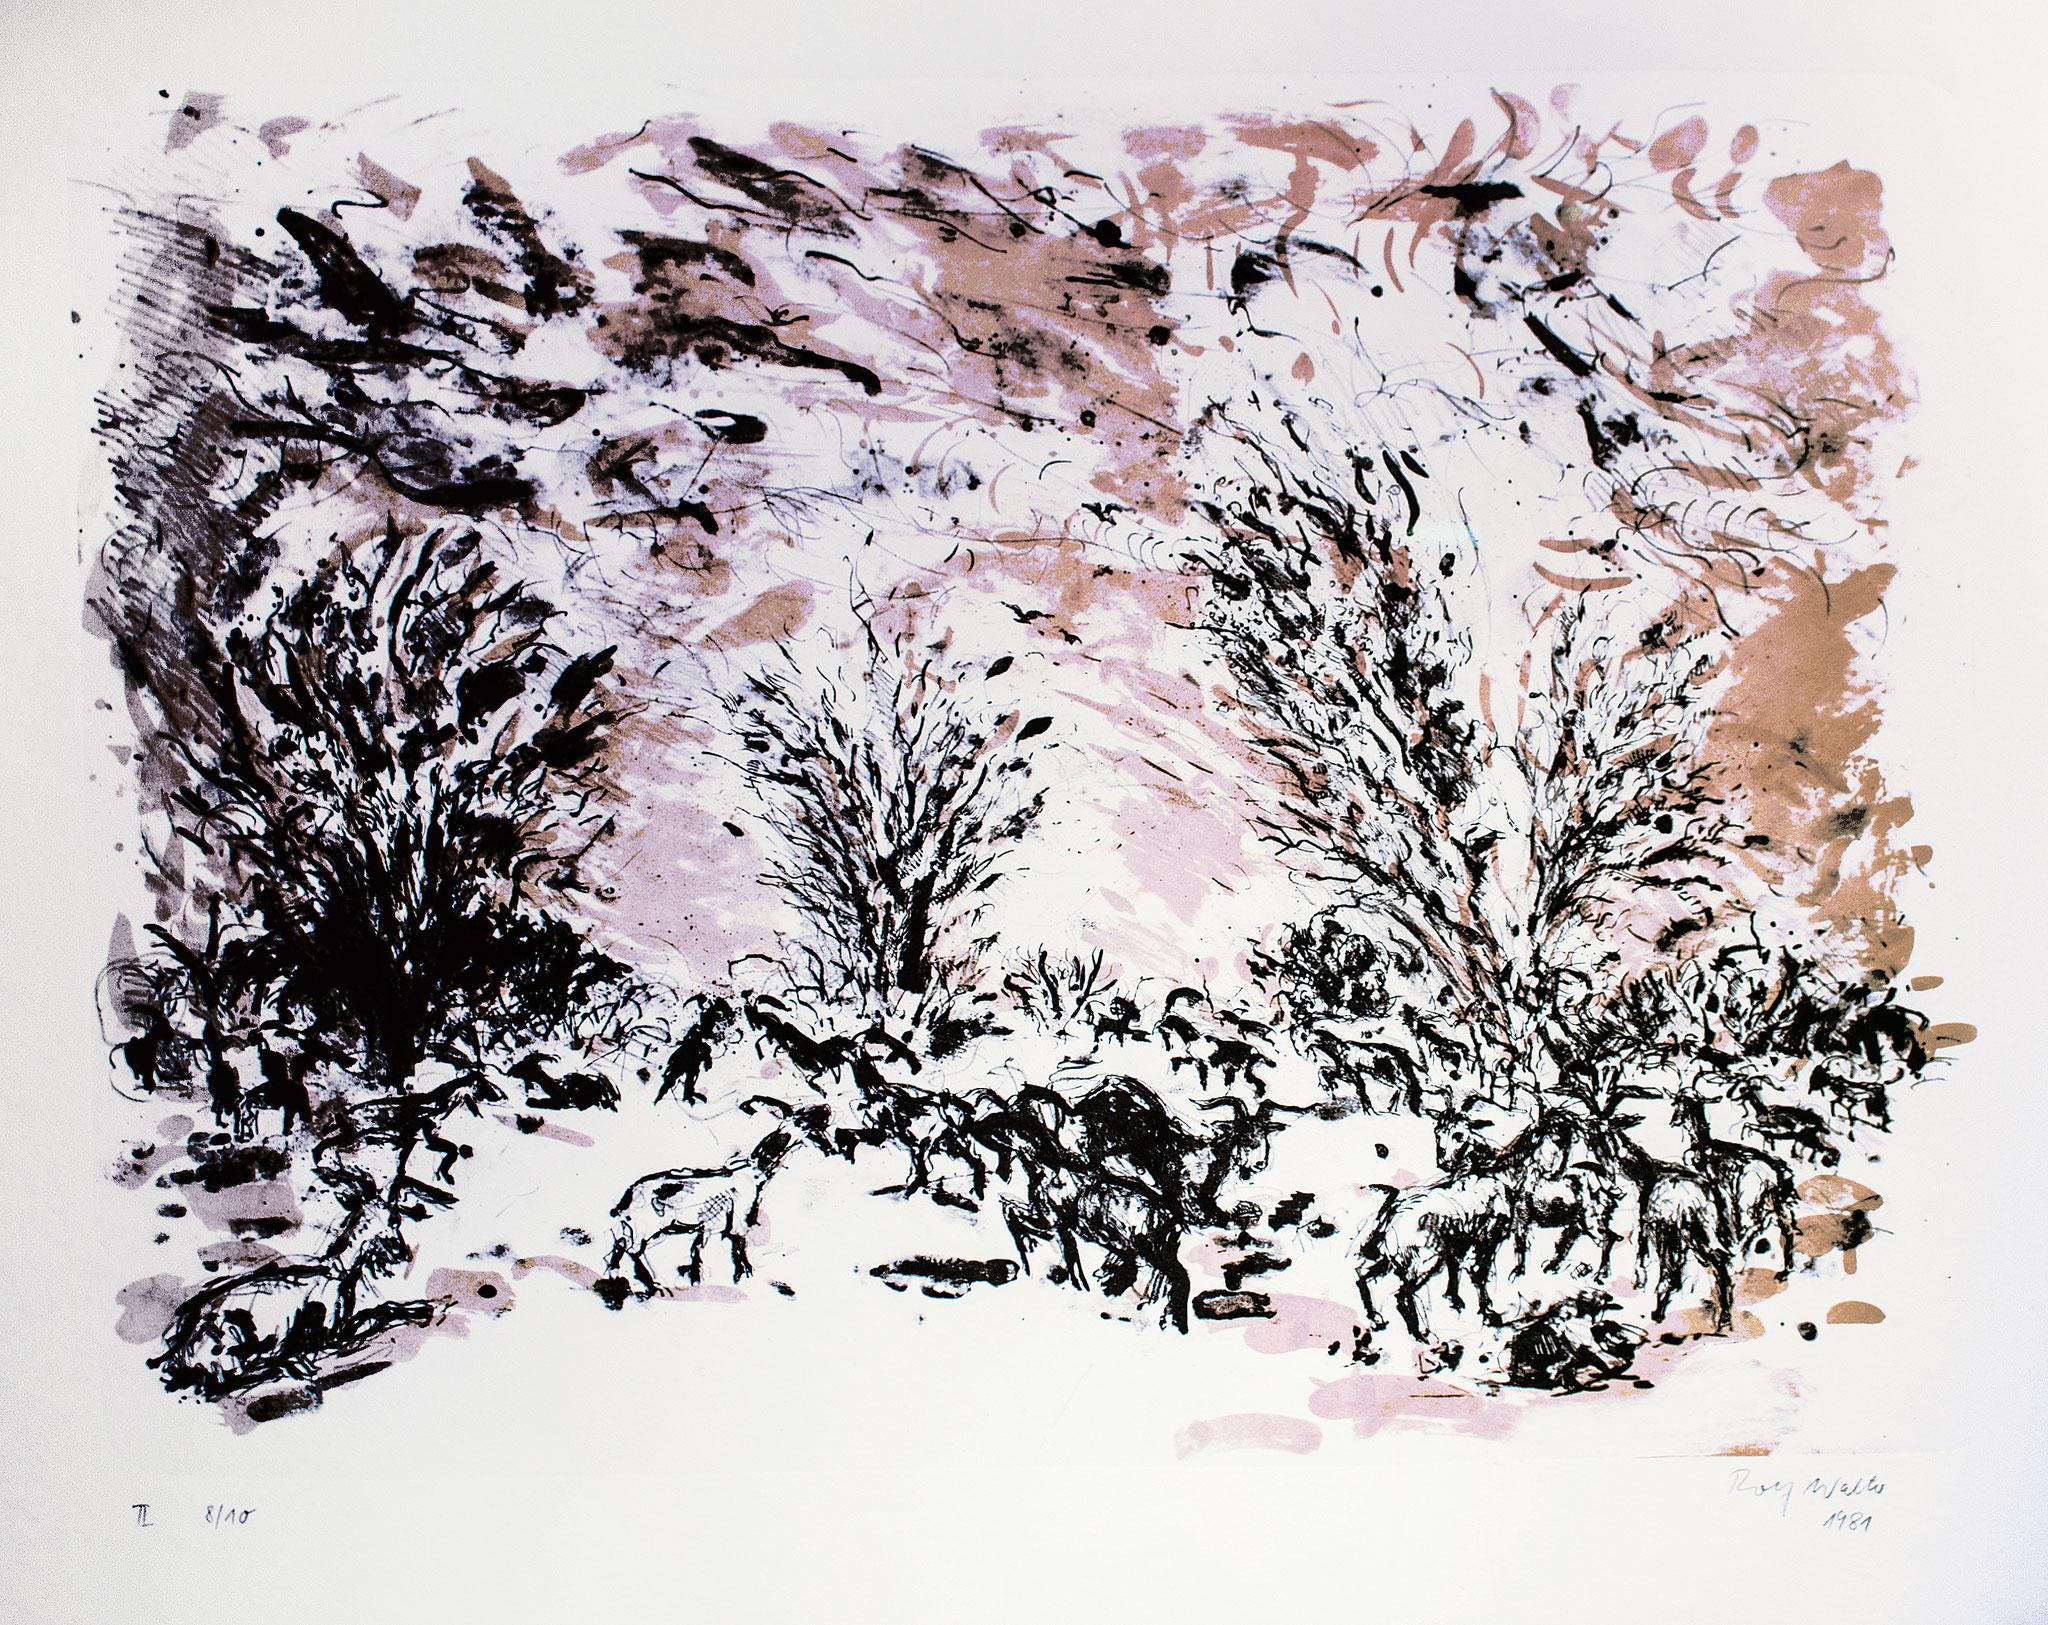 Ziegen; 1981, Lithographie, 2 farbig, 48,5cm x 64,5 cm